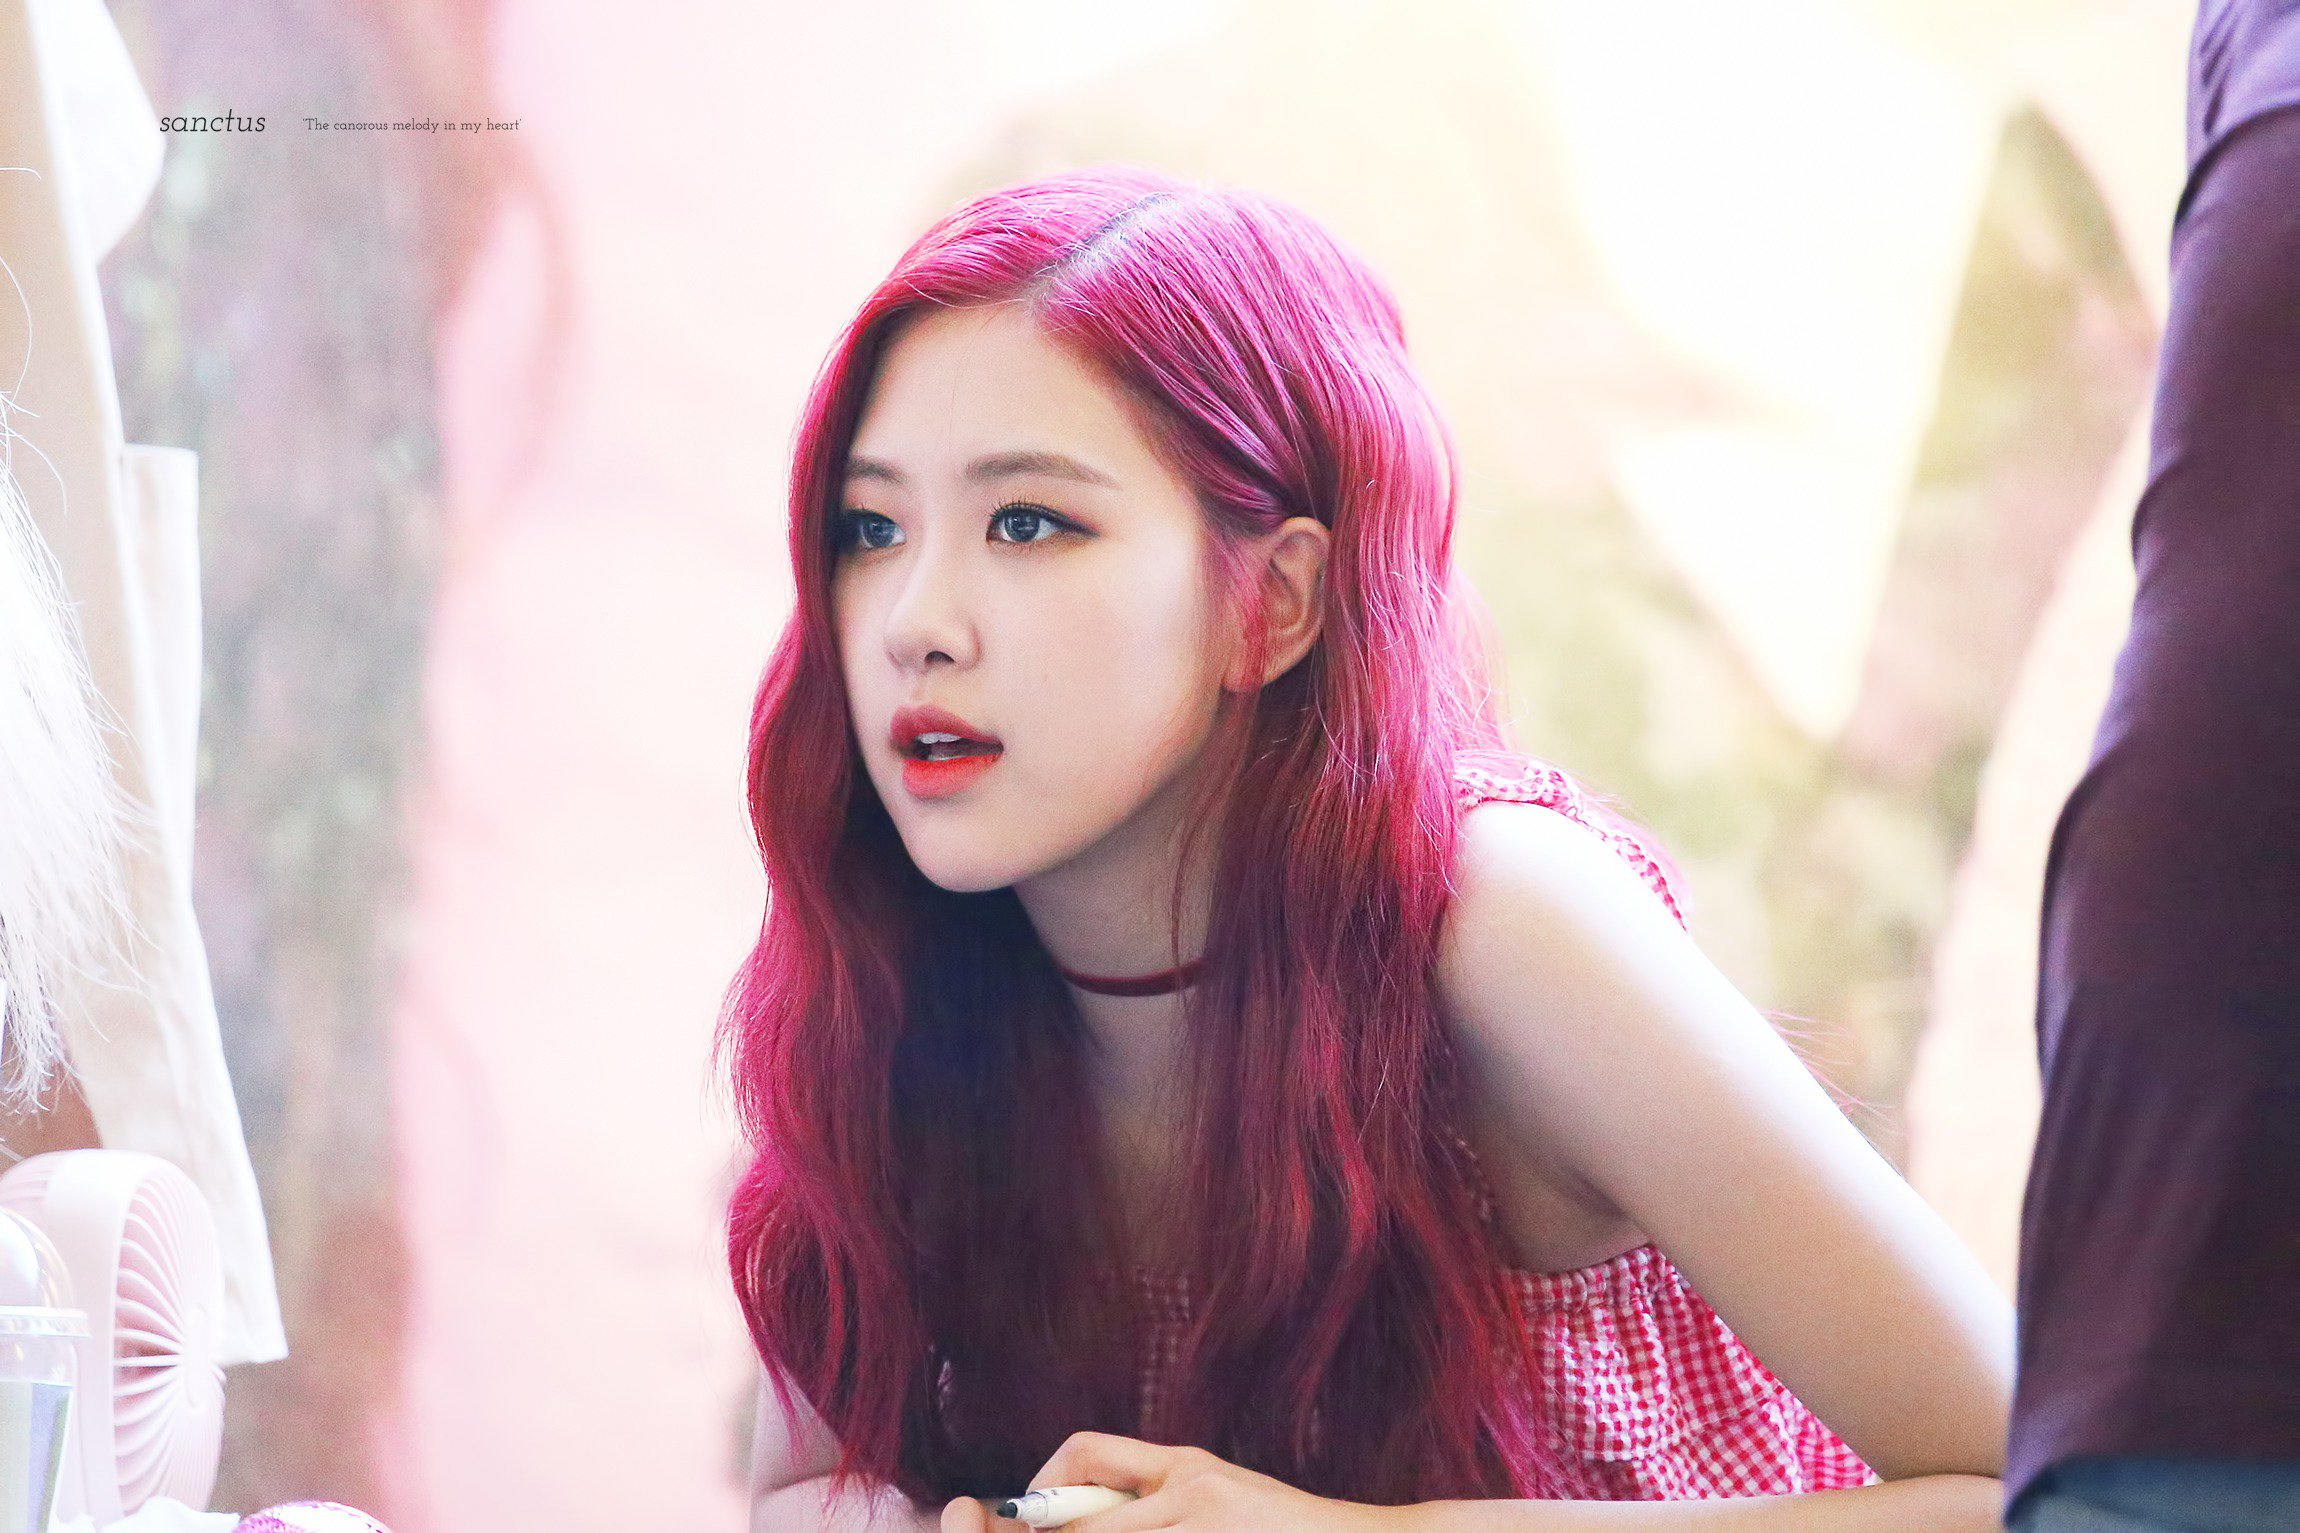 Rose BLACKPINK: BLACKPINK Rose Fansign Event Yeouido July 8, 2018 IFC Atrium 5